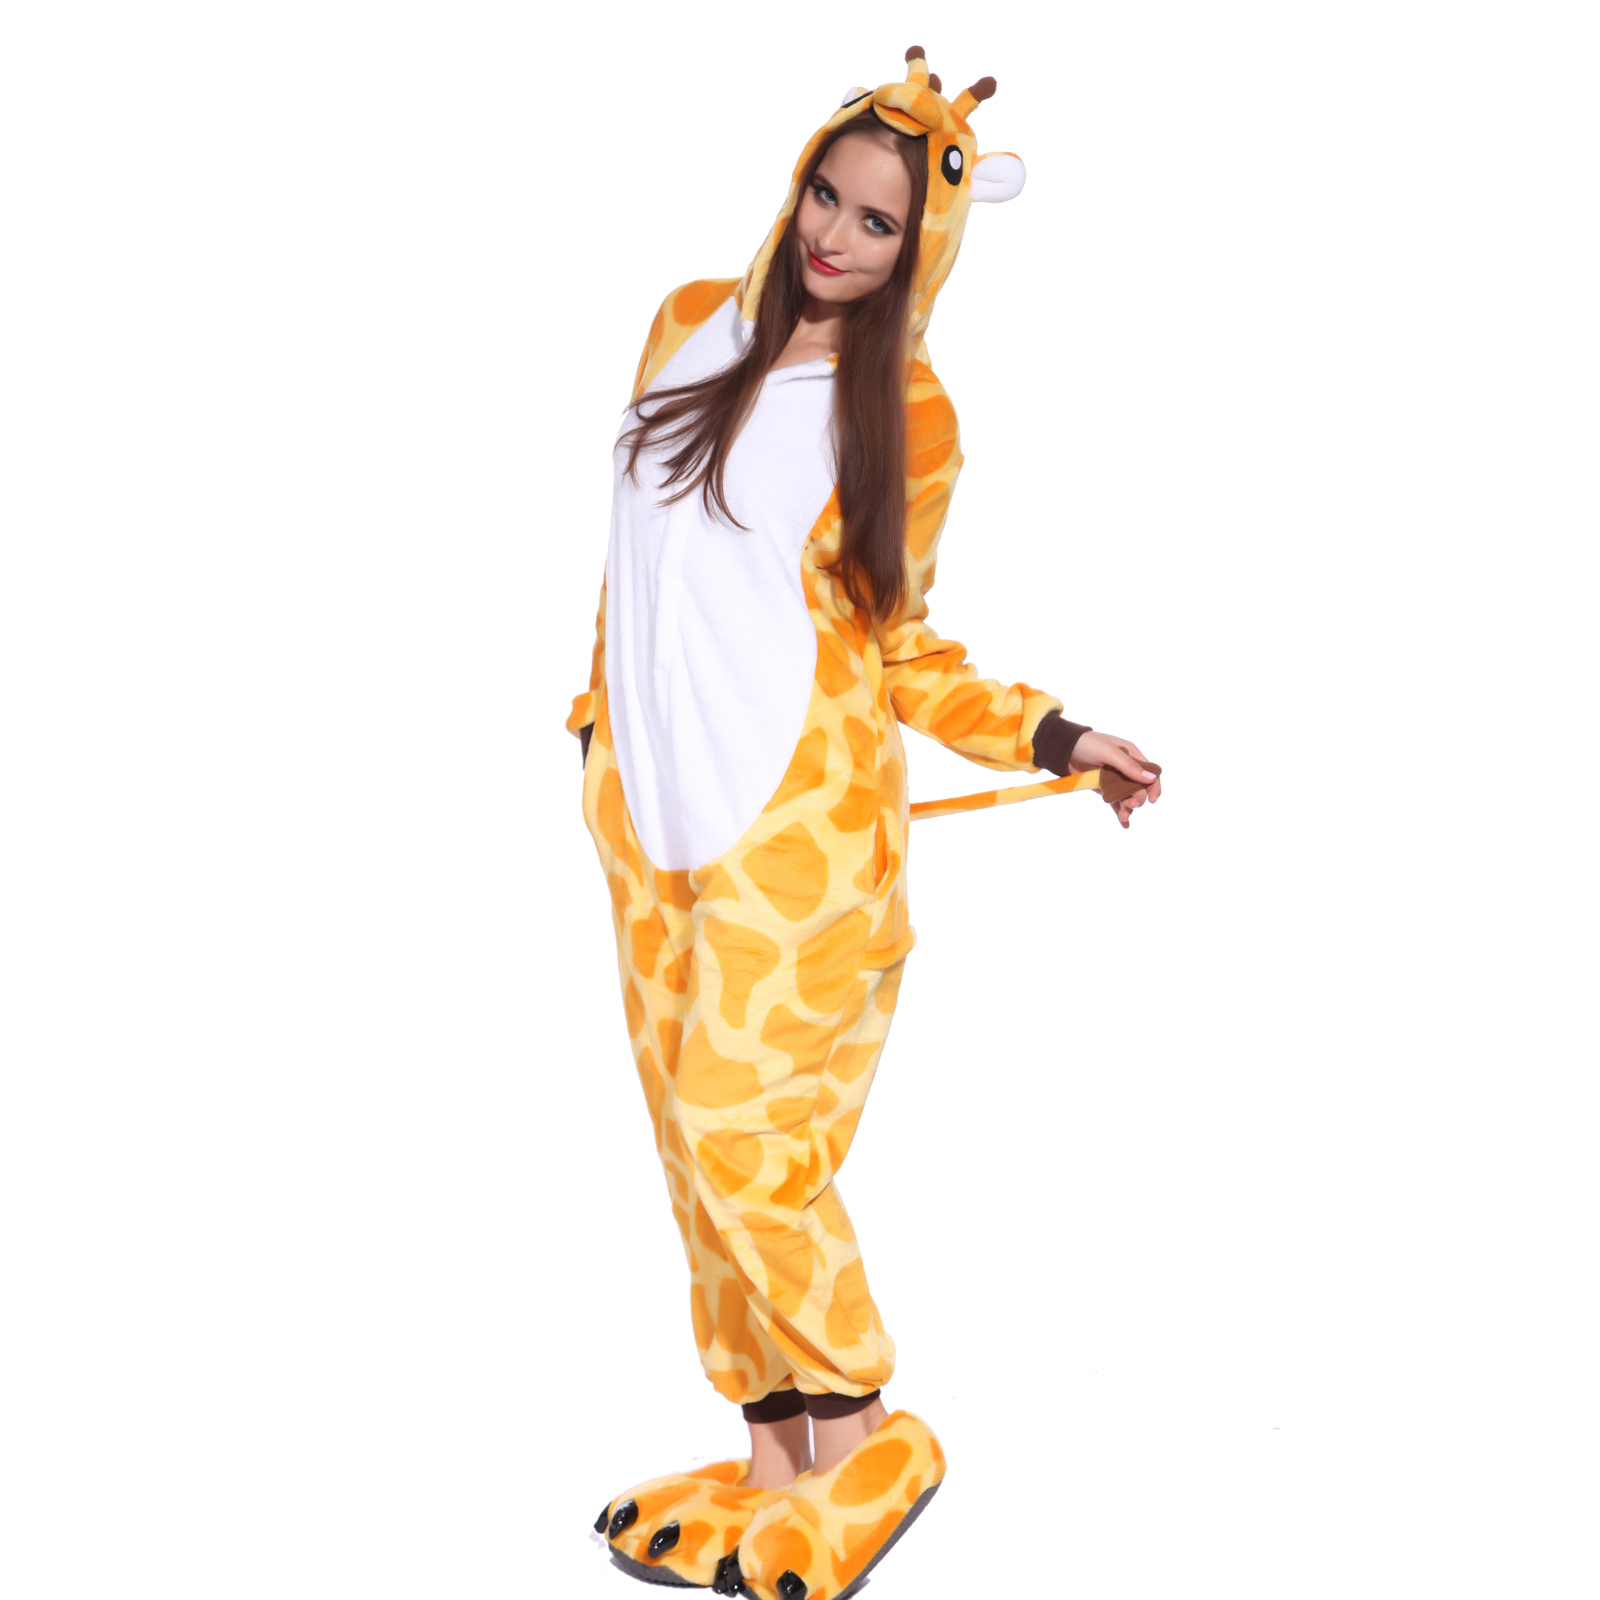 pyjama combinaison costume deguisement animal panda ours 26 design enfant adulte ebay. Black Bedroom Furniture Sets. Home Design Ideas